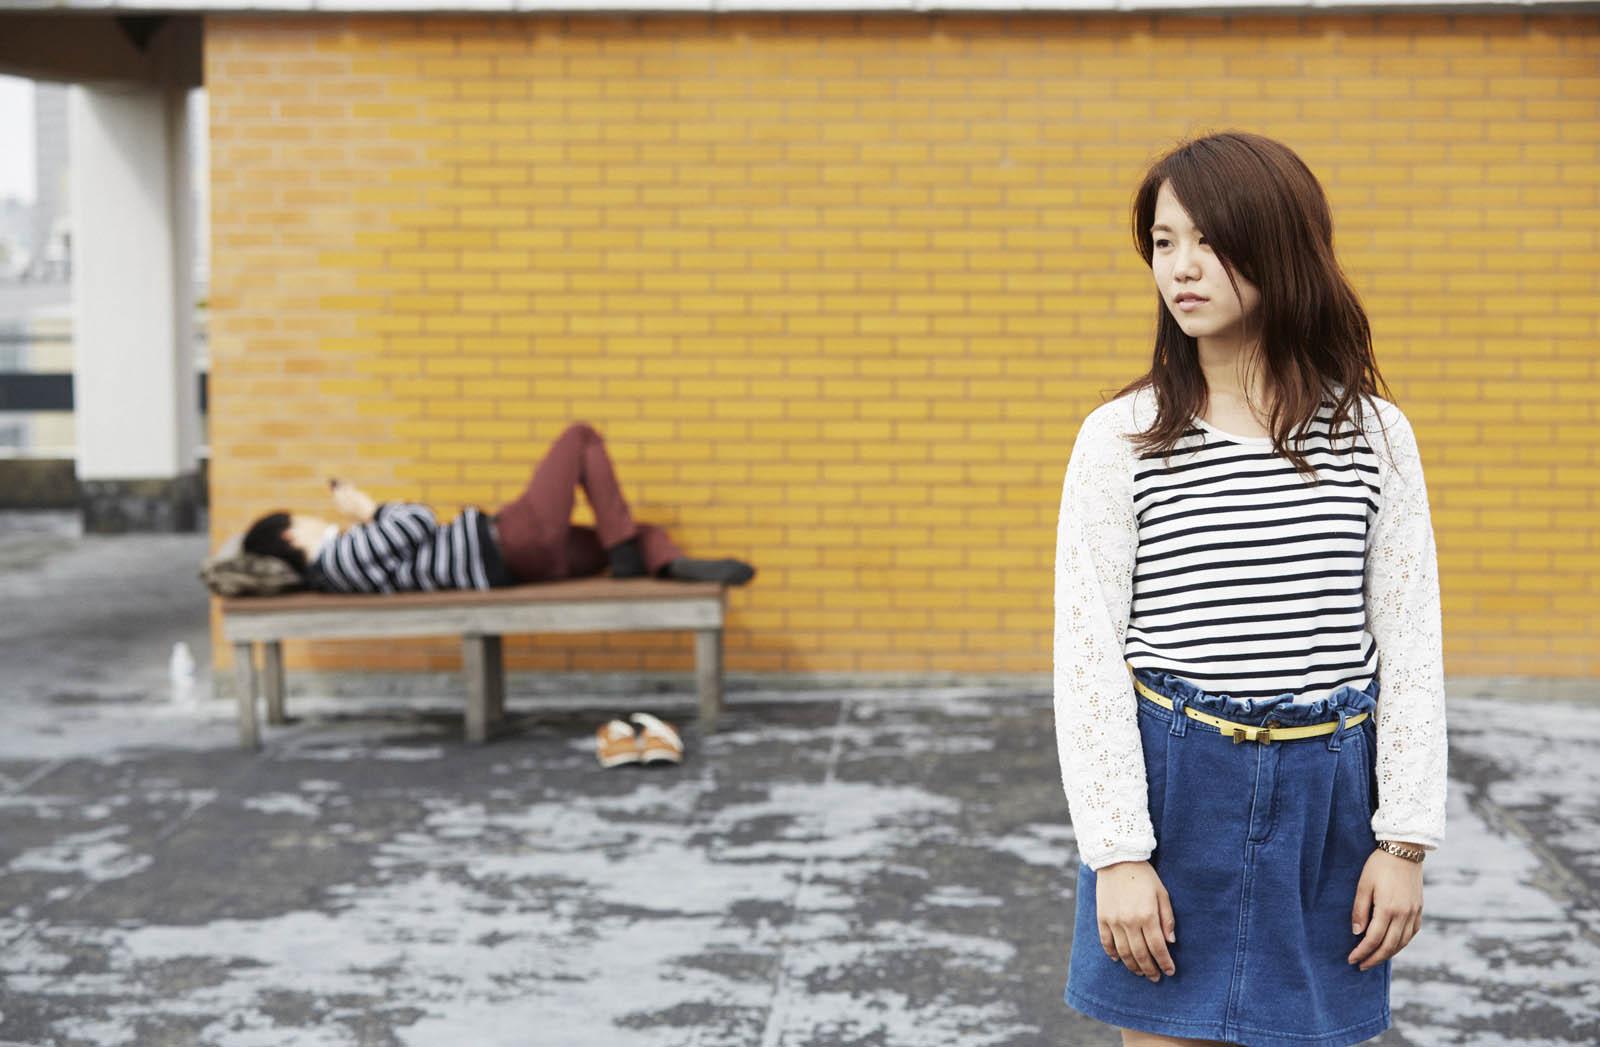 Natsuki Kameda, Praktikantin und Studentin